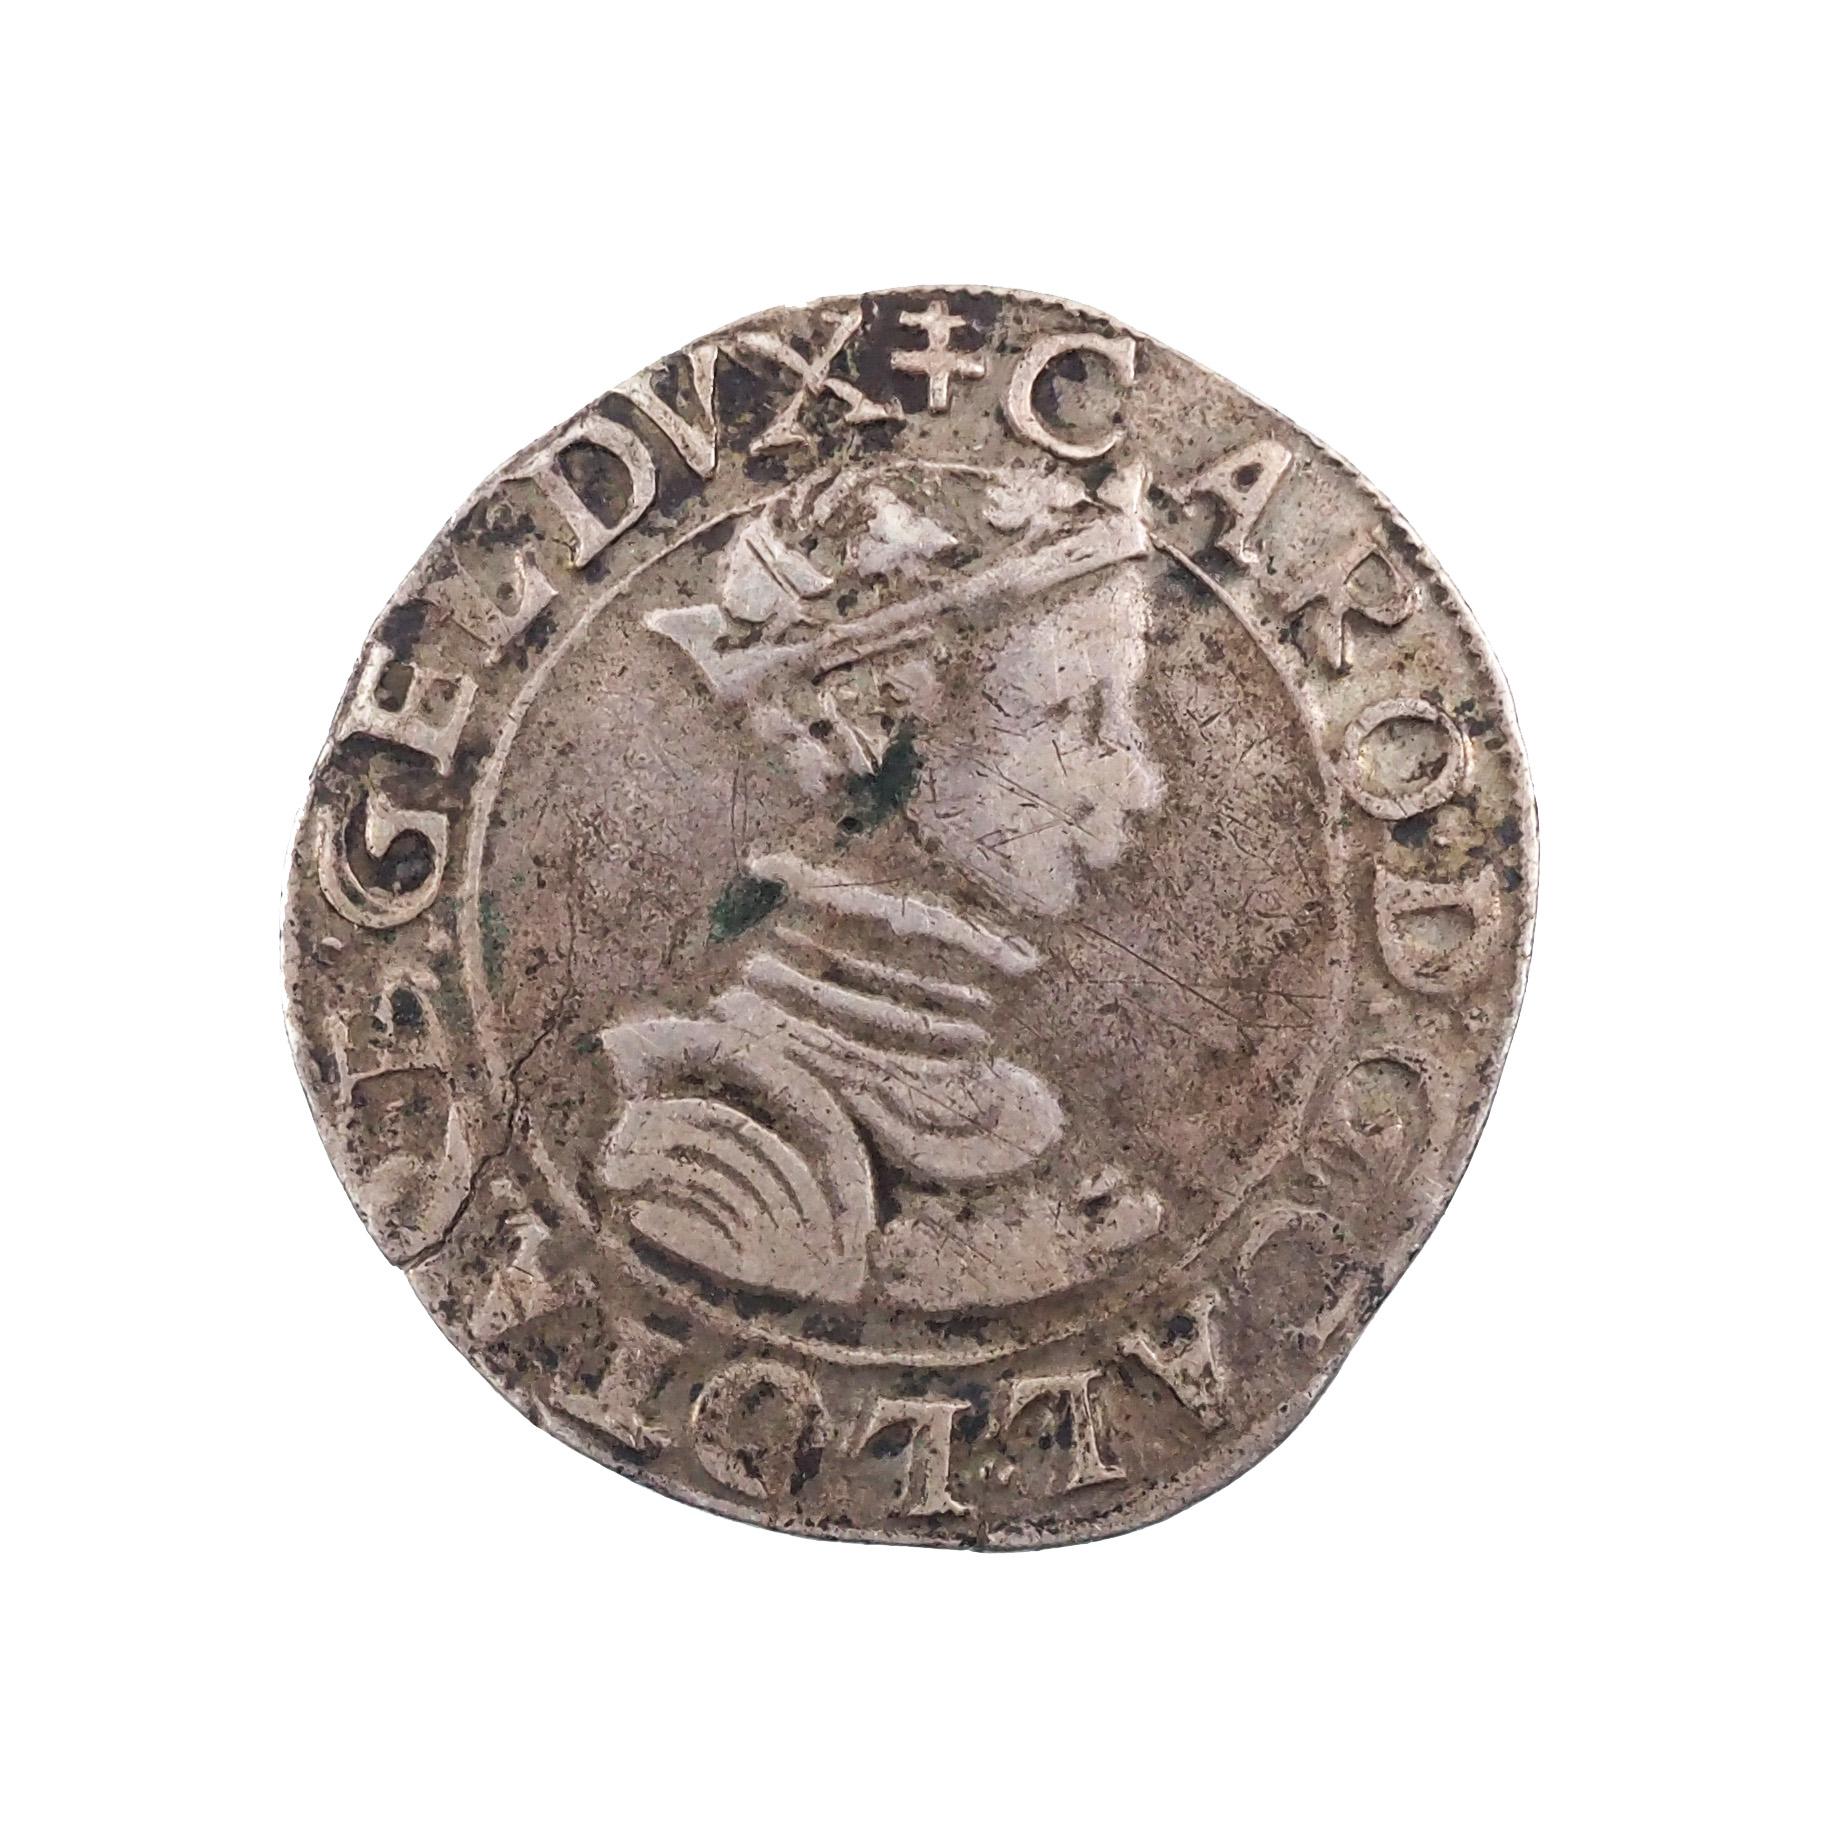 Charles III (1545-1608), Teston au buste juvénile, Nancy, Argent, Flon. 5